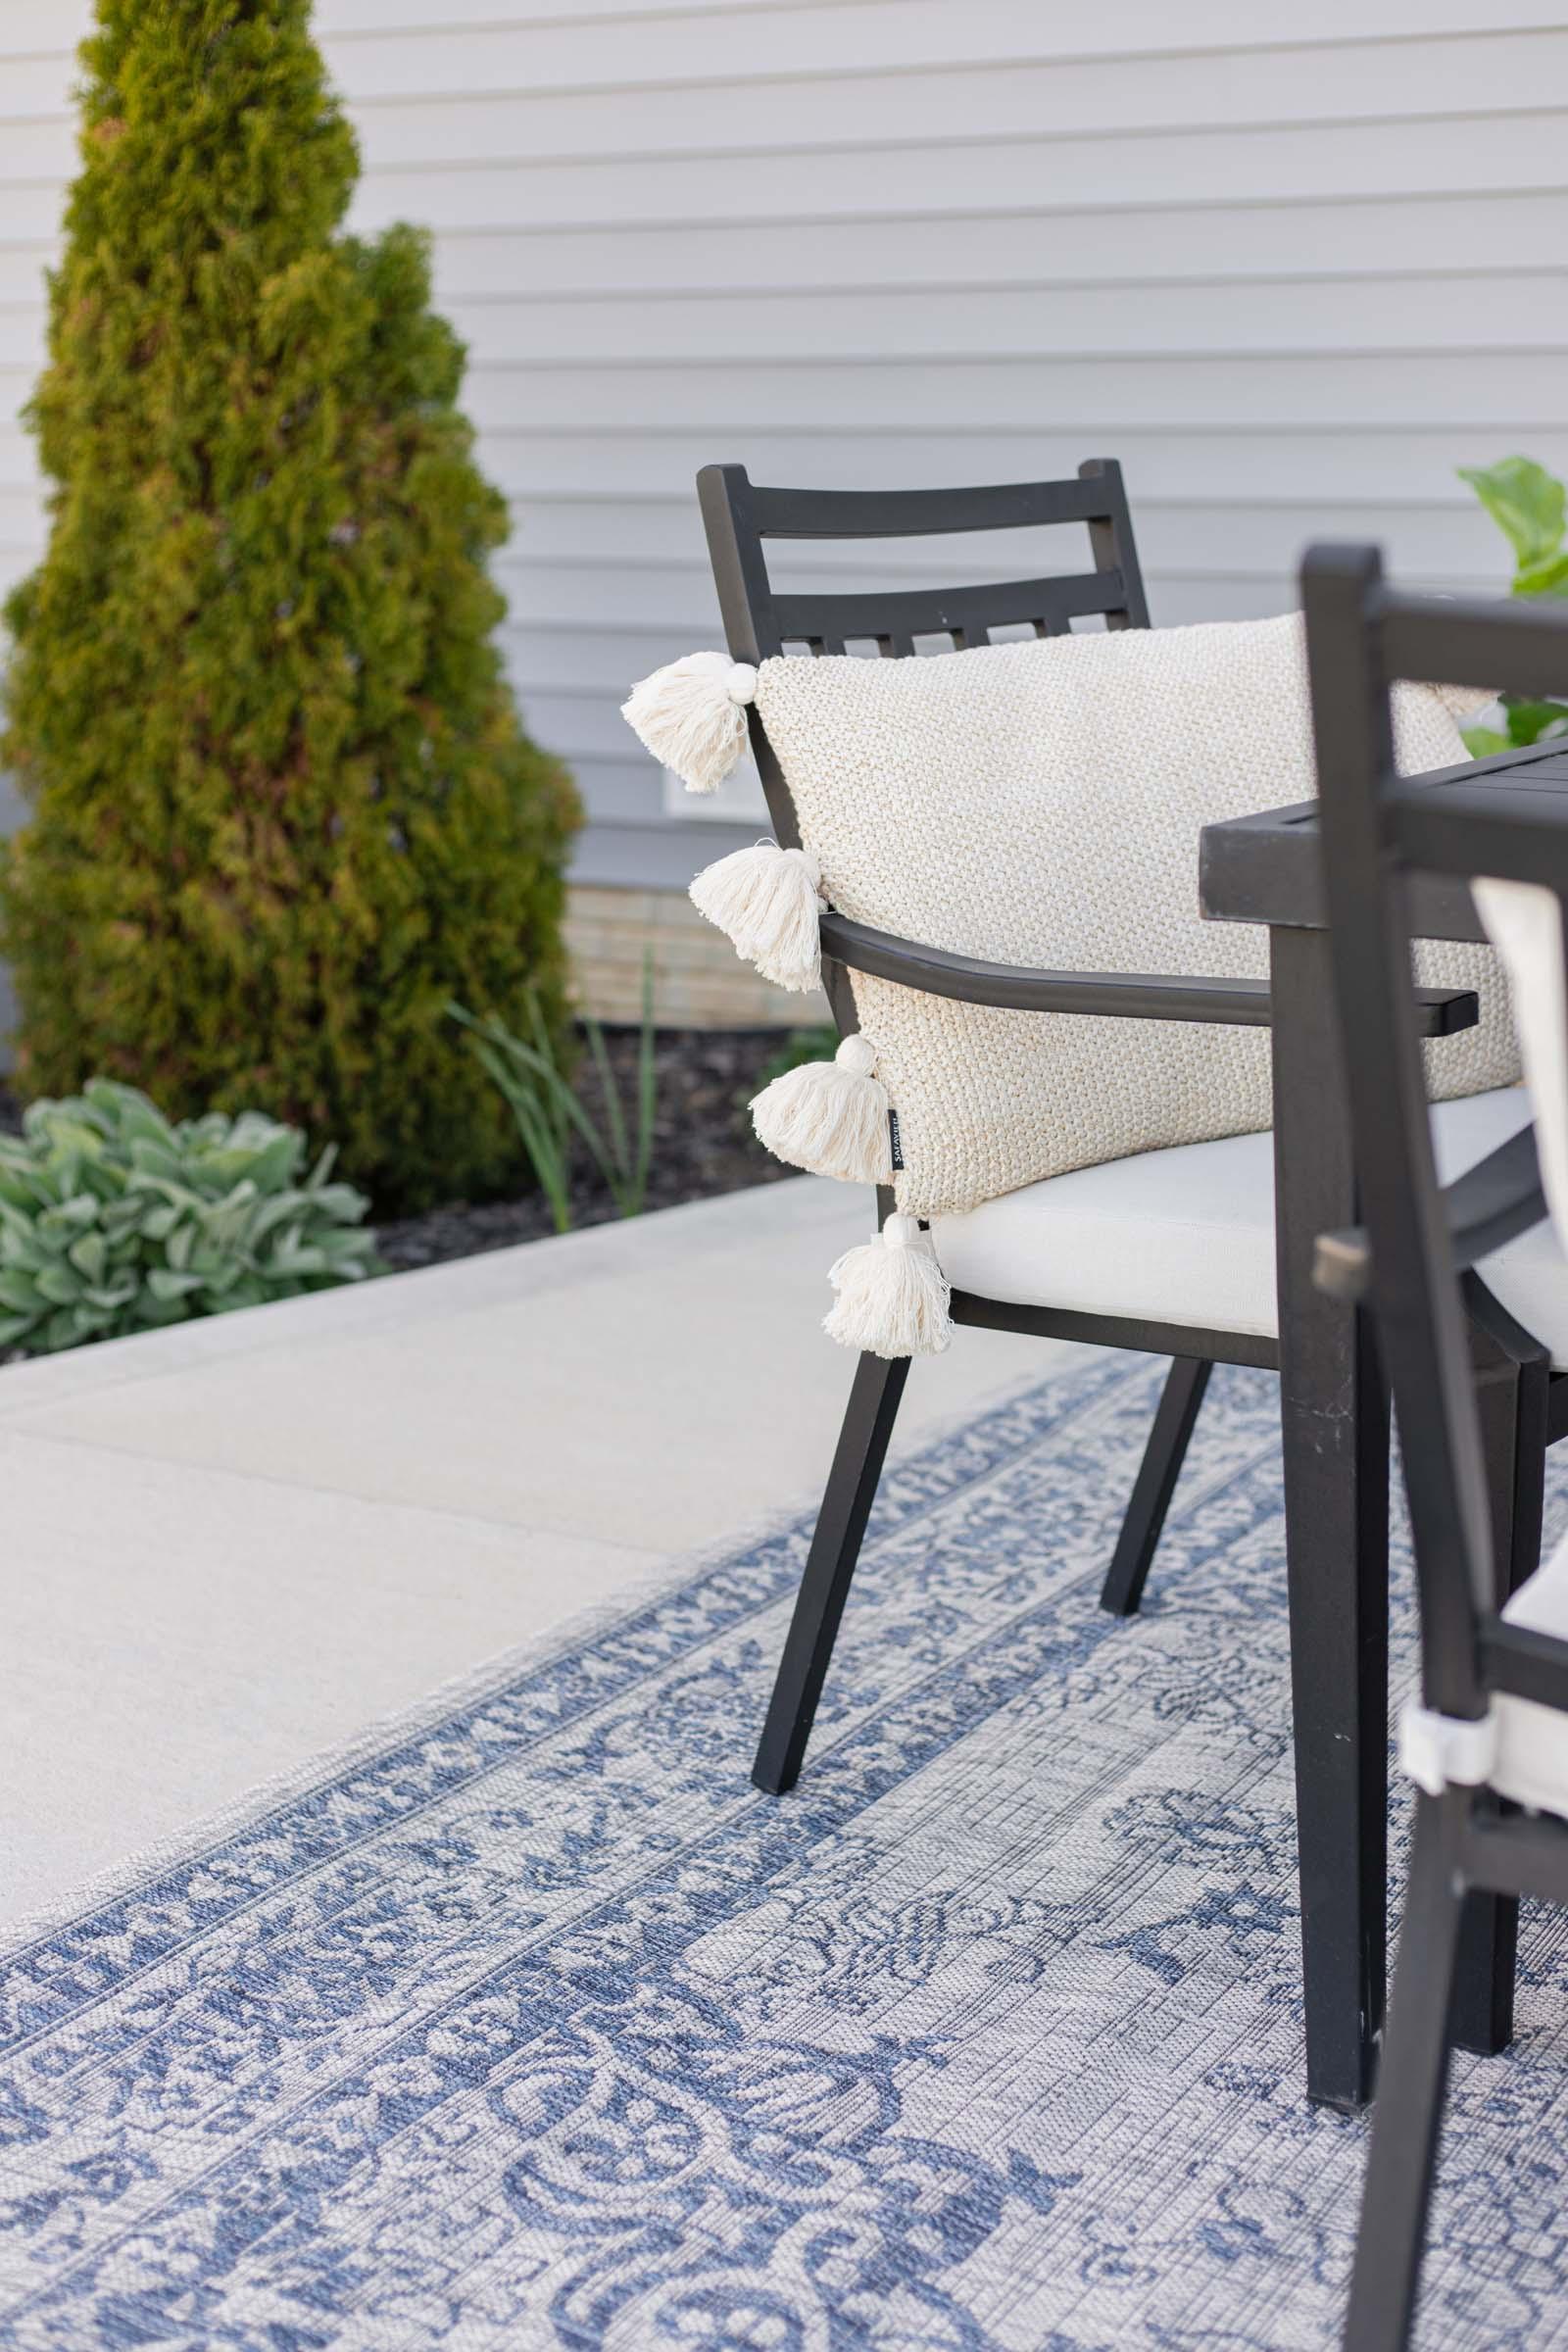 blue outdoor rug, black metal chair, lumbar pillow with tassels